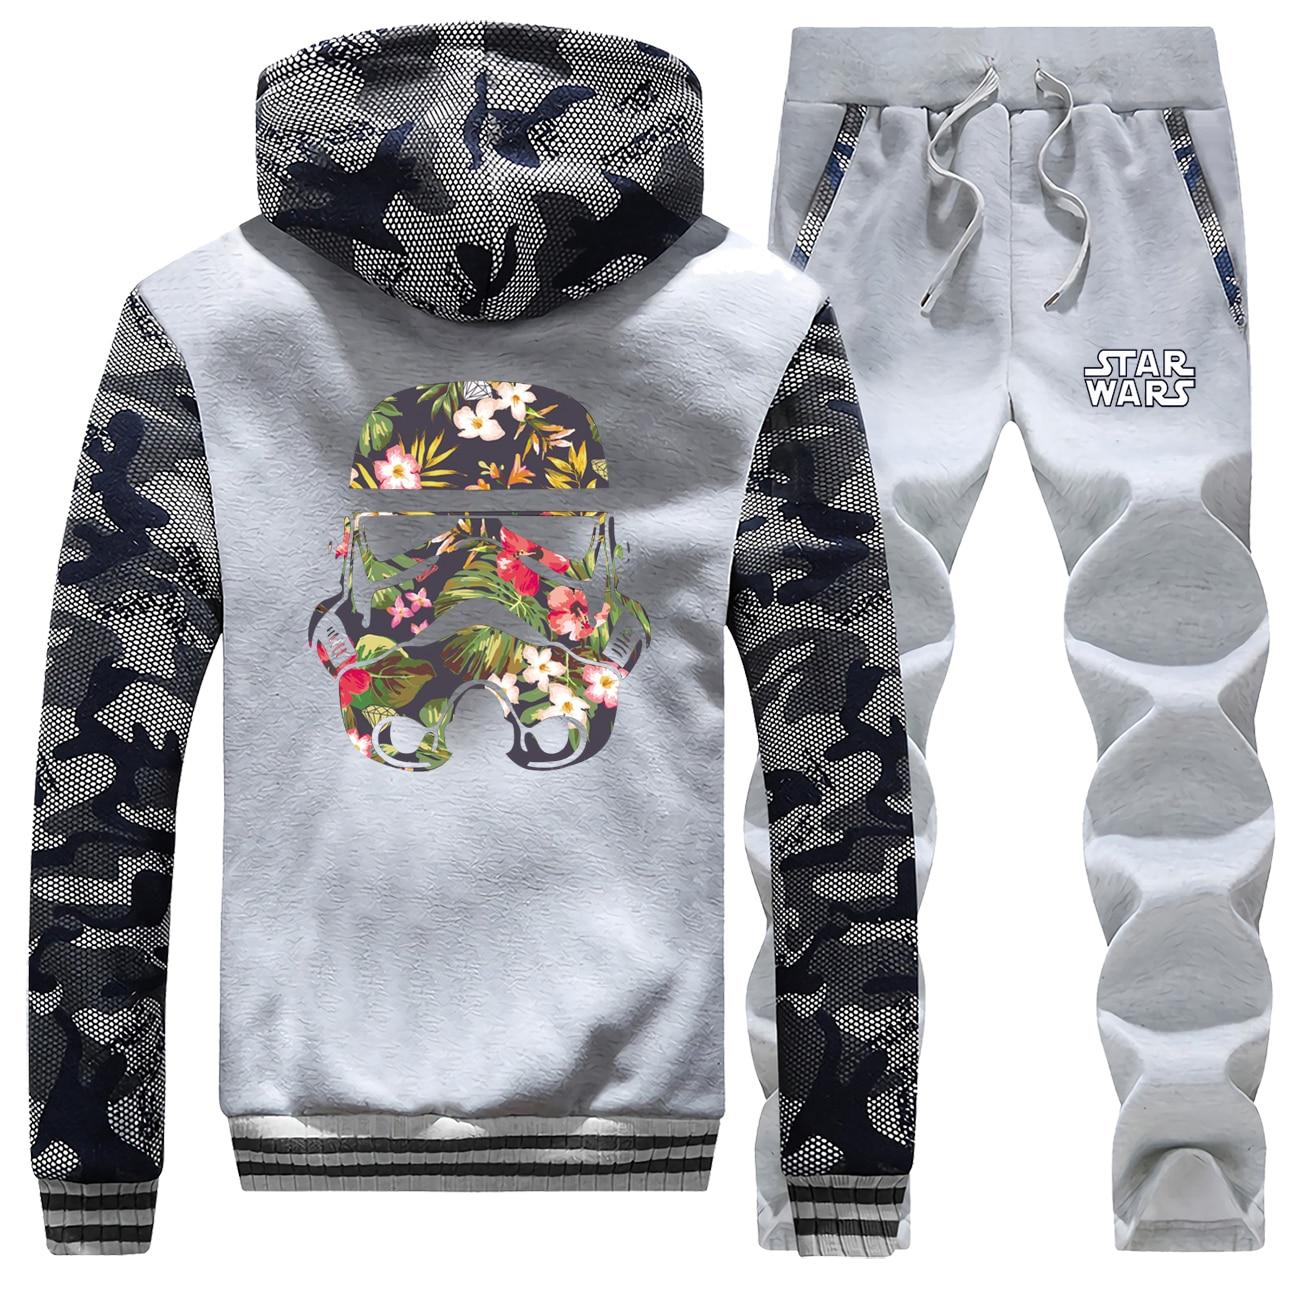 Star Wars Hot Sale Winter Funny Stormtrooper Camouflage Hoodie Men Coat Thick Suit Sweatshirt Suit Warm Jackets+2Piece Set Pants